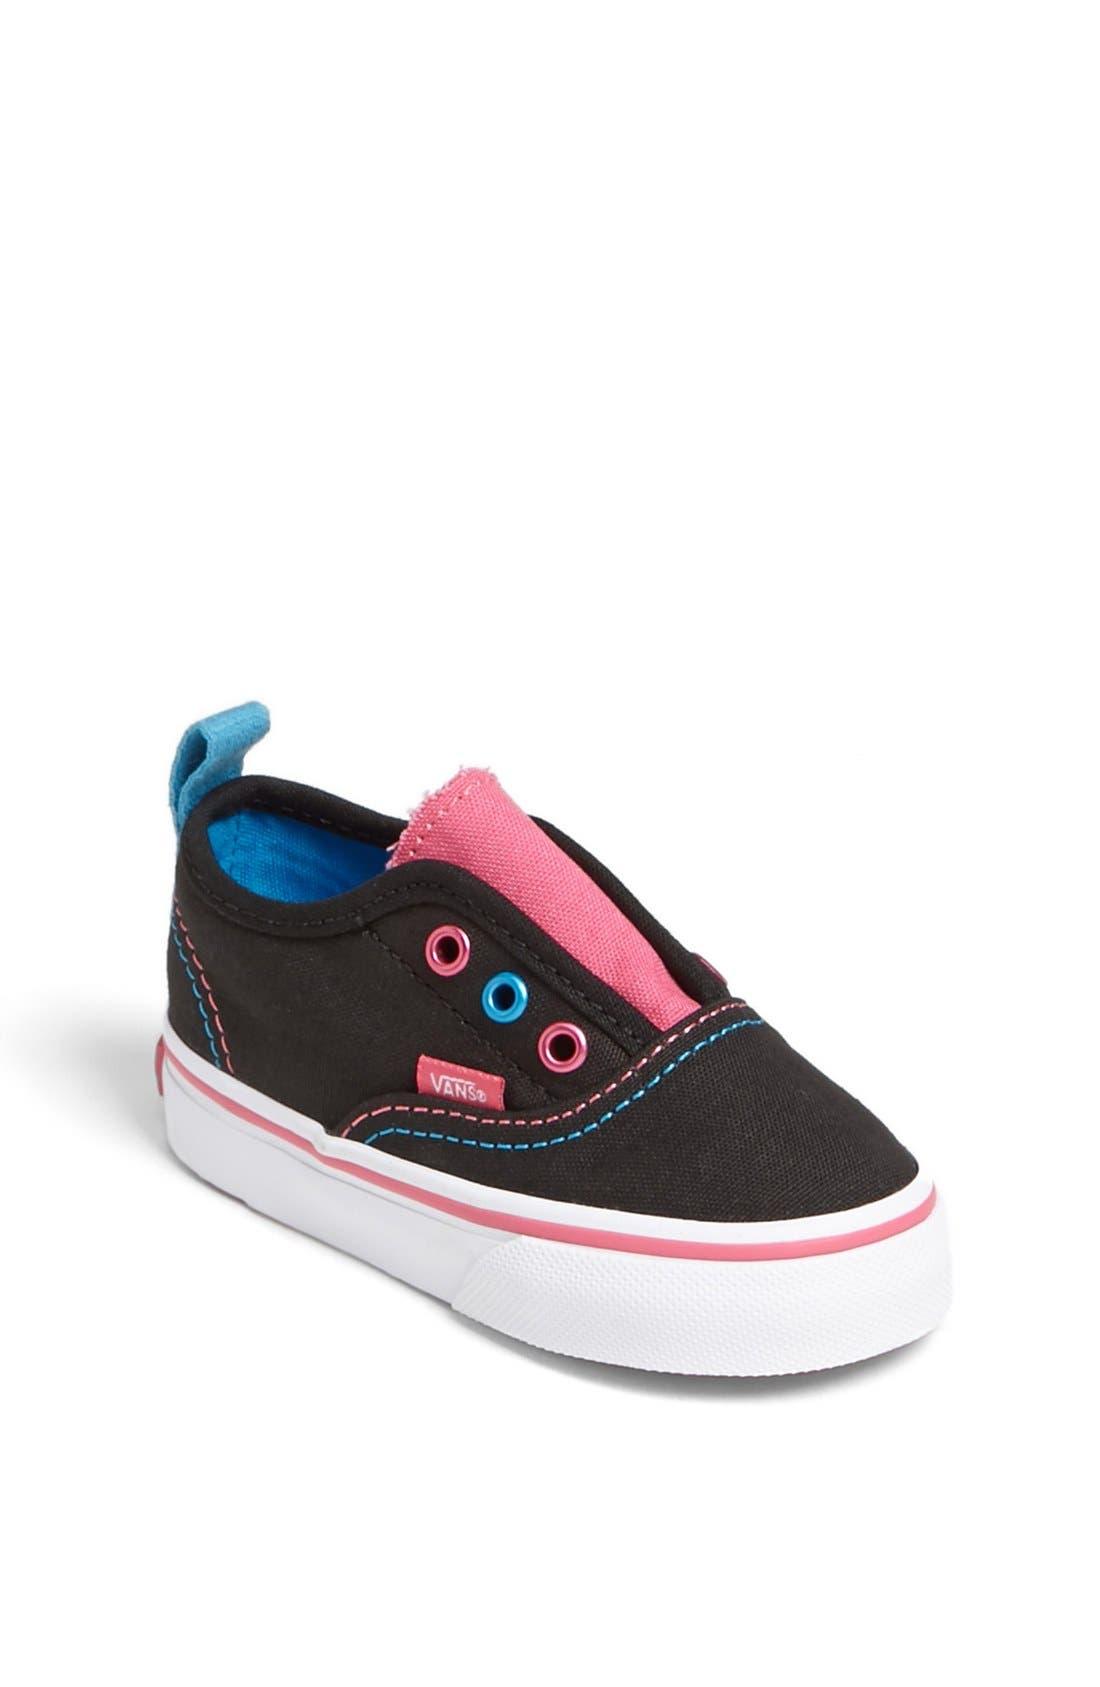 Alternate Image 1 Selected - Vans 'Authentic V' Sneaker (Baby, Walker & Toddler)